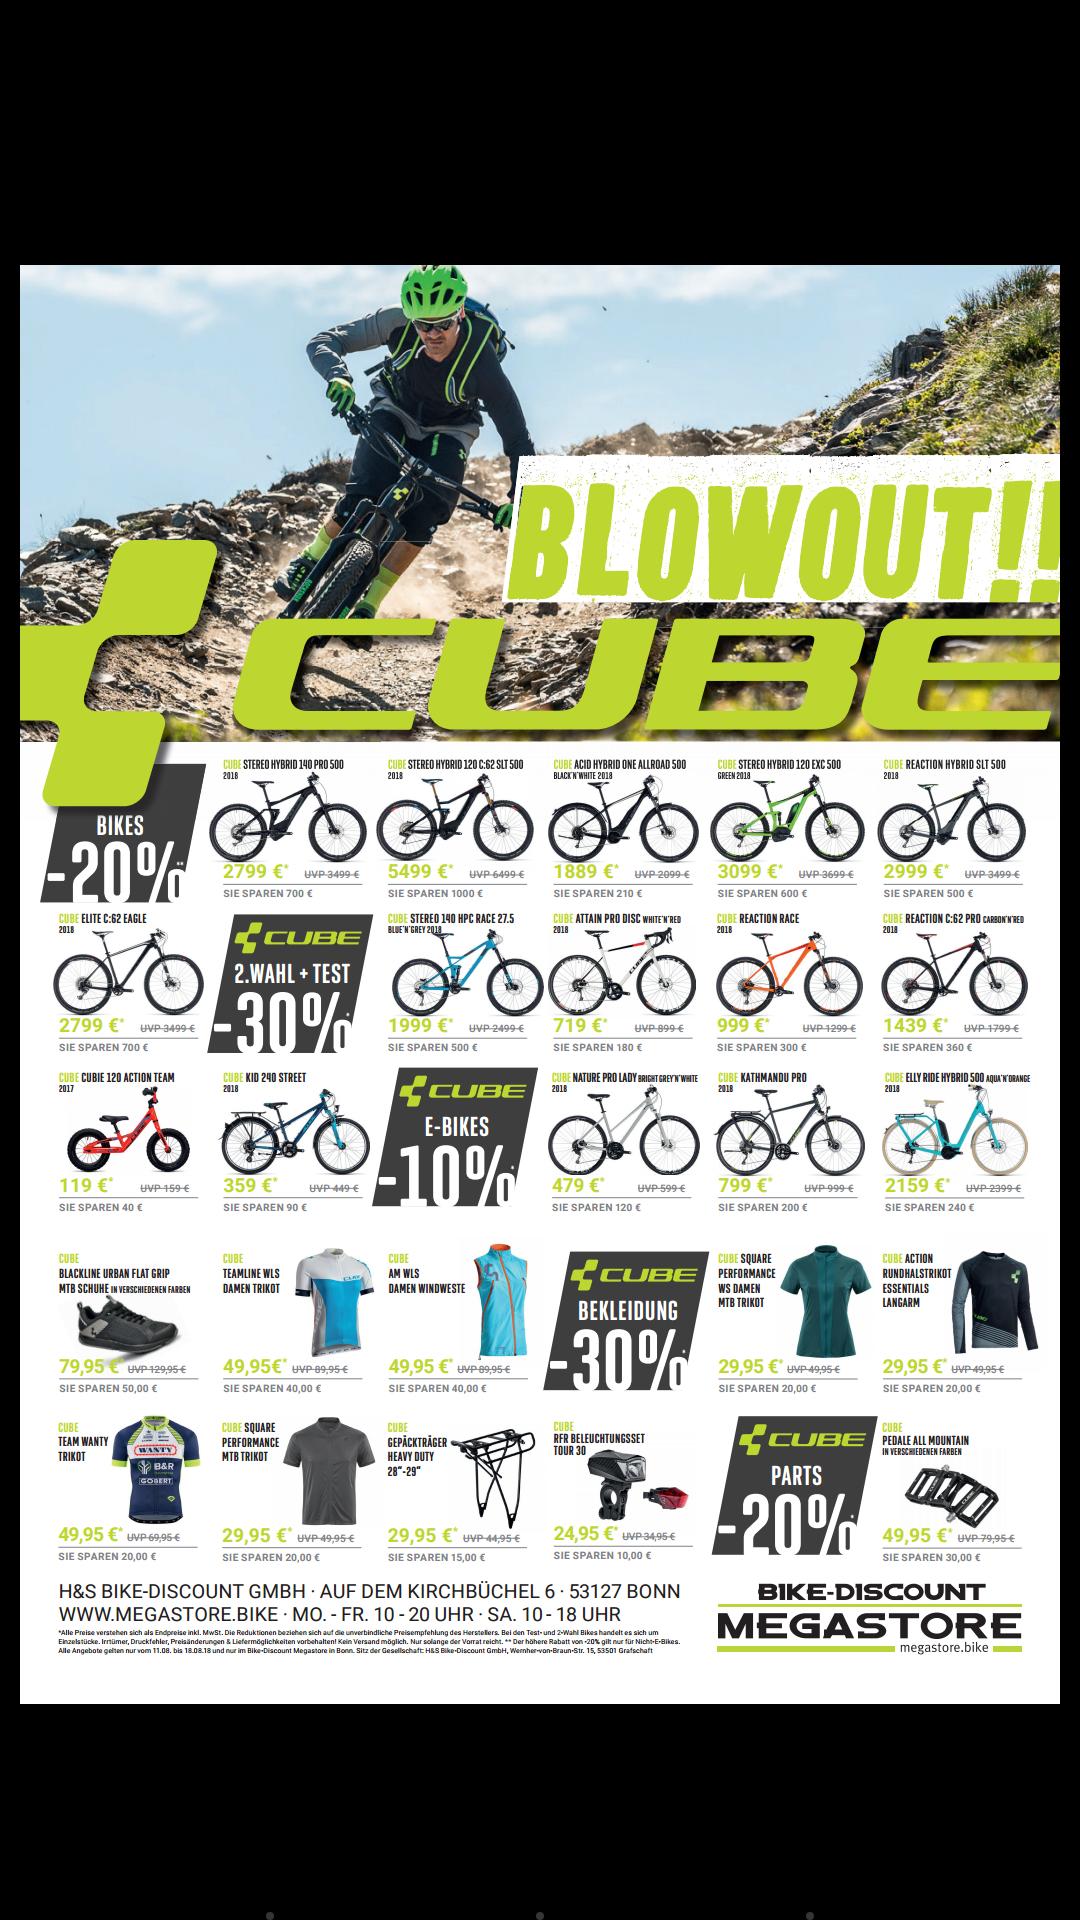 [Lokal] Megastore Summer Cube SALE Fahrräder eBikes, Mountainbike, Fahrrad